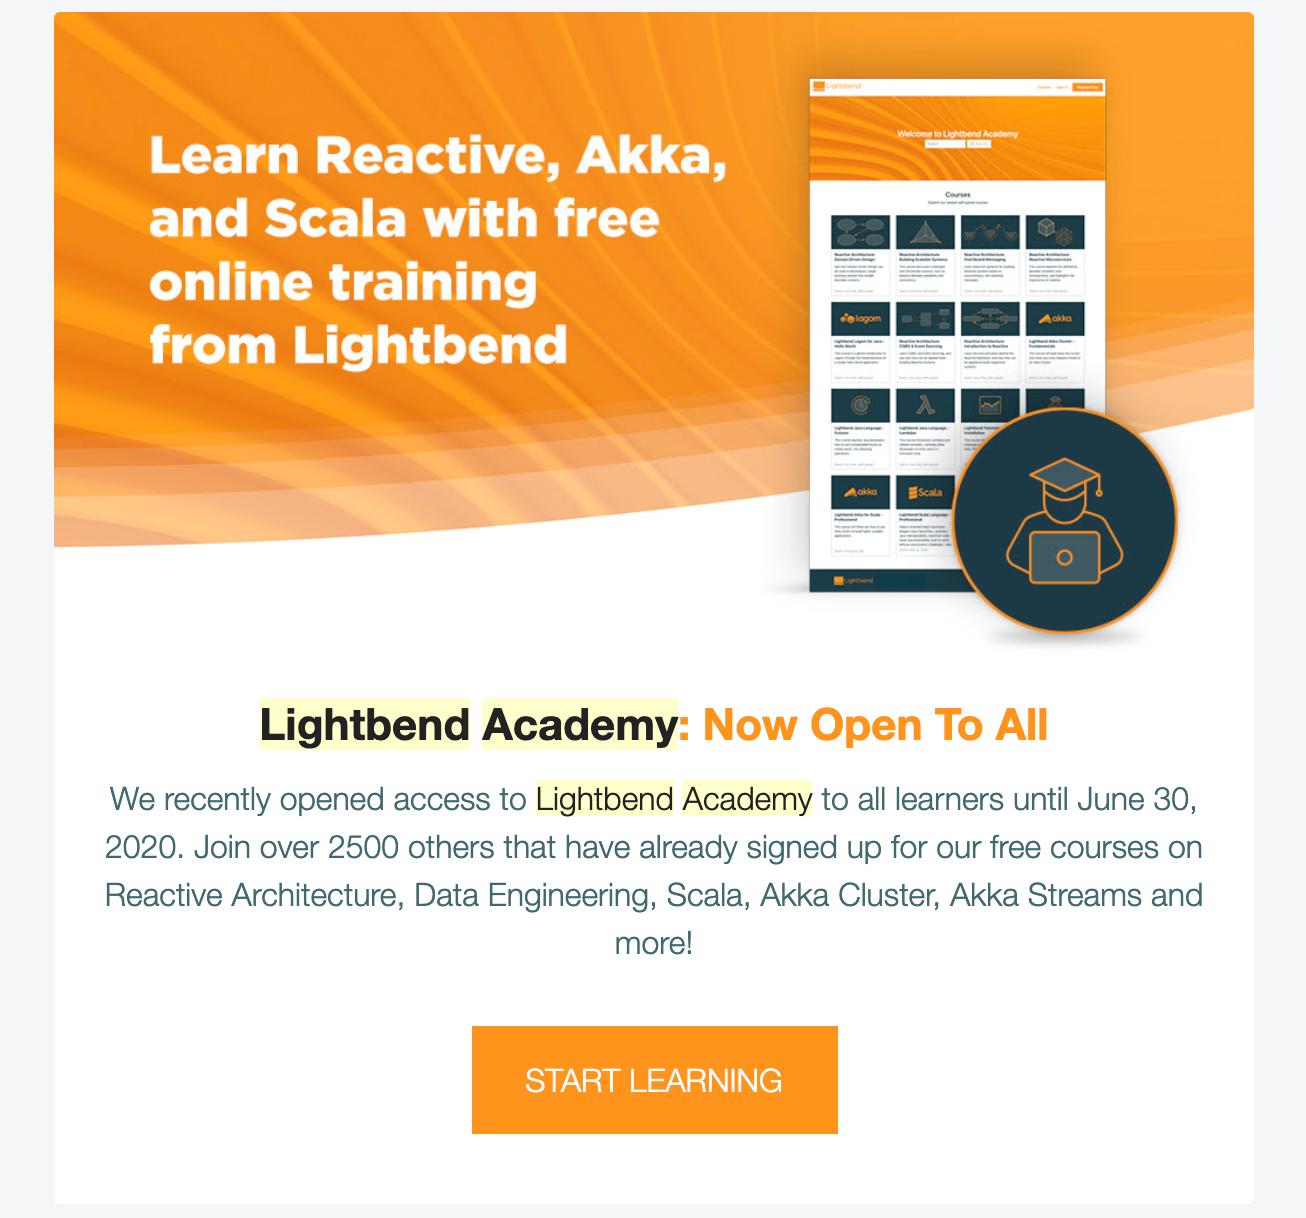 https://academy.lightbend.com/